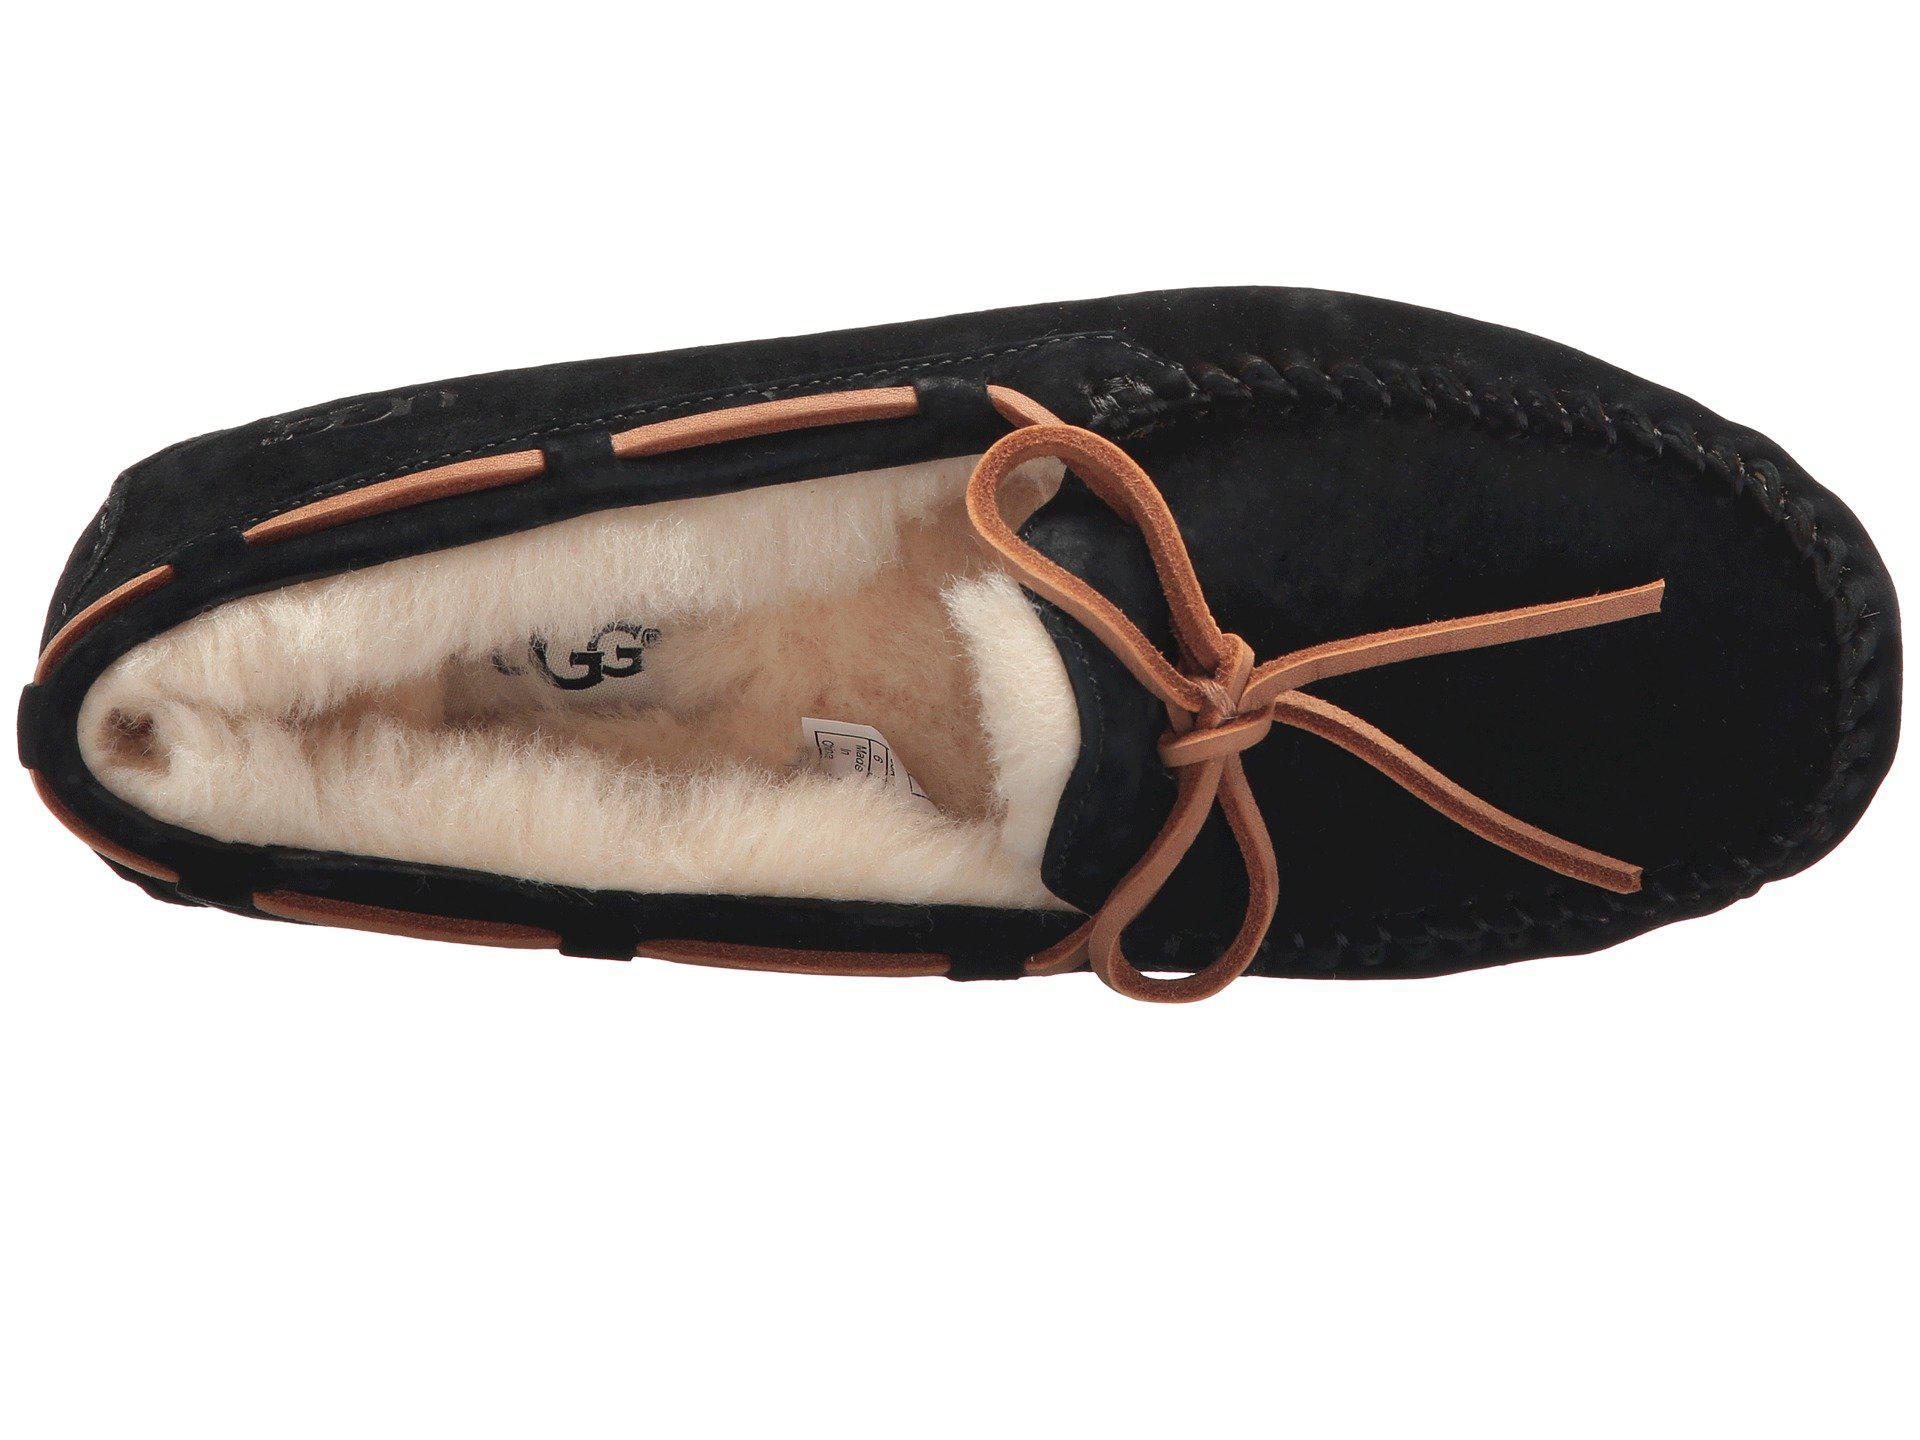 6dc3d34585e7a Ugg - Black Dakota (pewter Suede) Women s Moccasin Shoes - Lyst. View  fullscreen